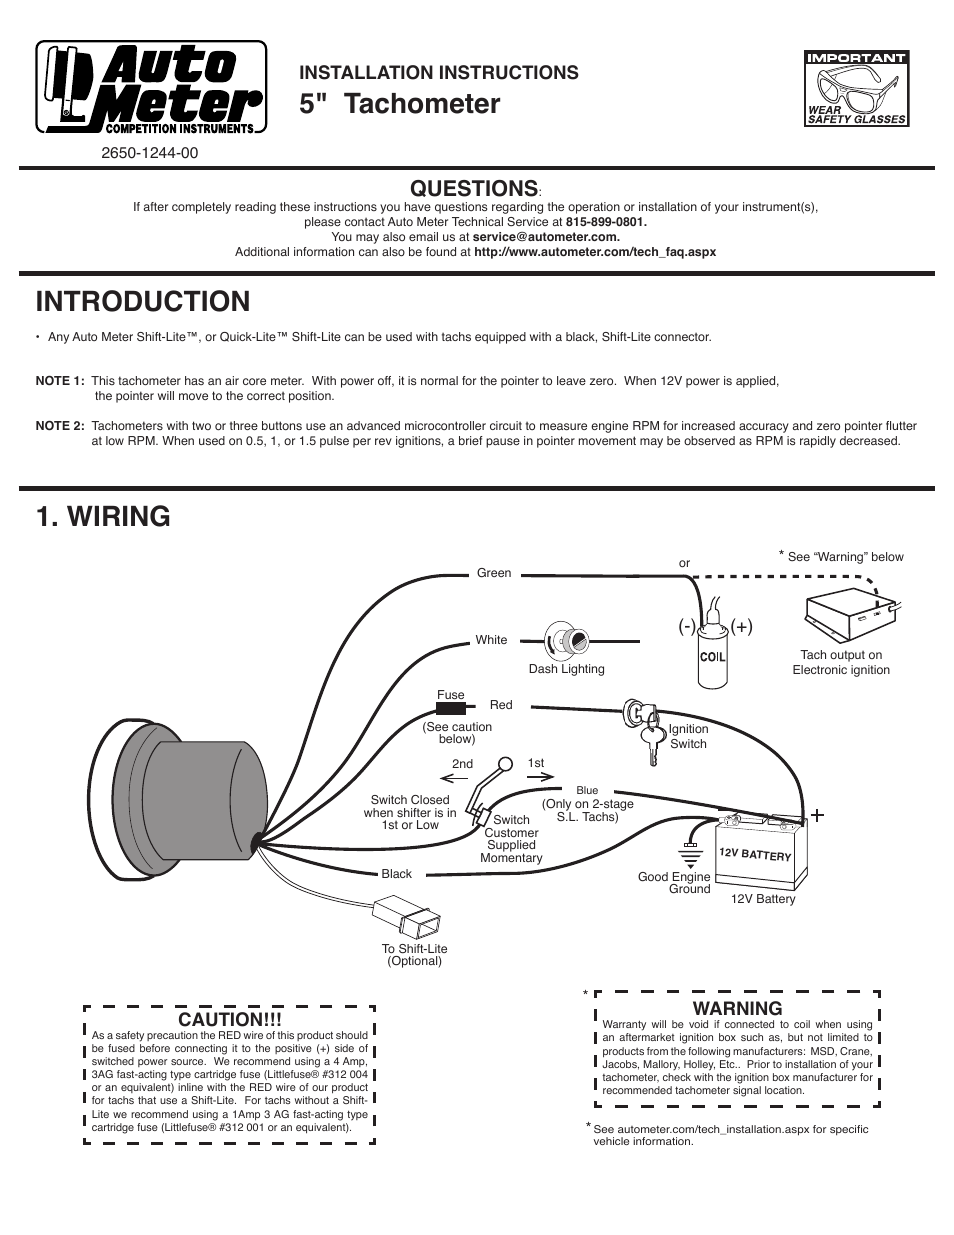 Auto Meter 4999 User Manual